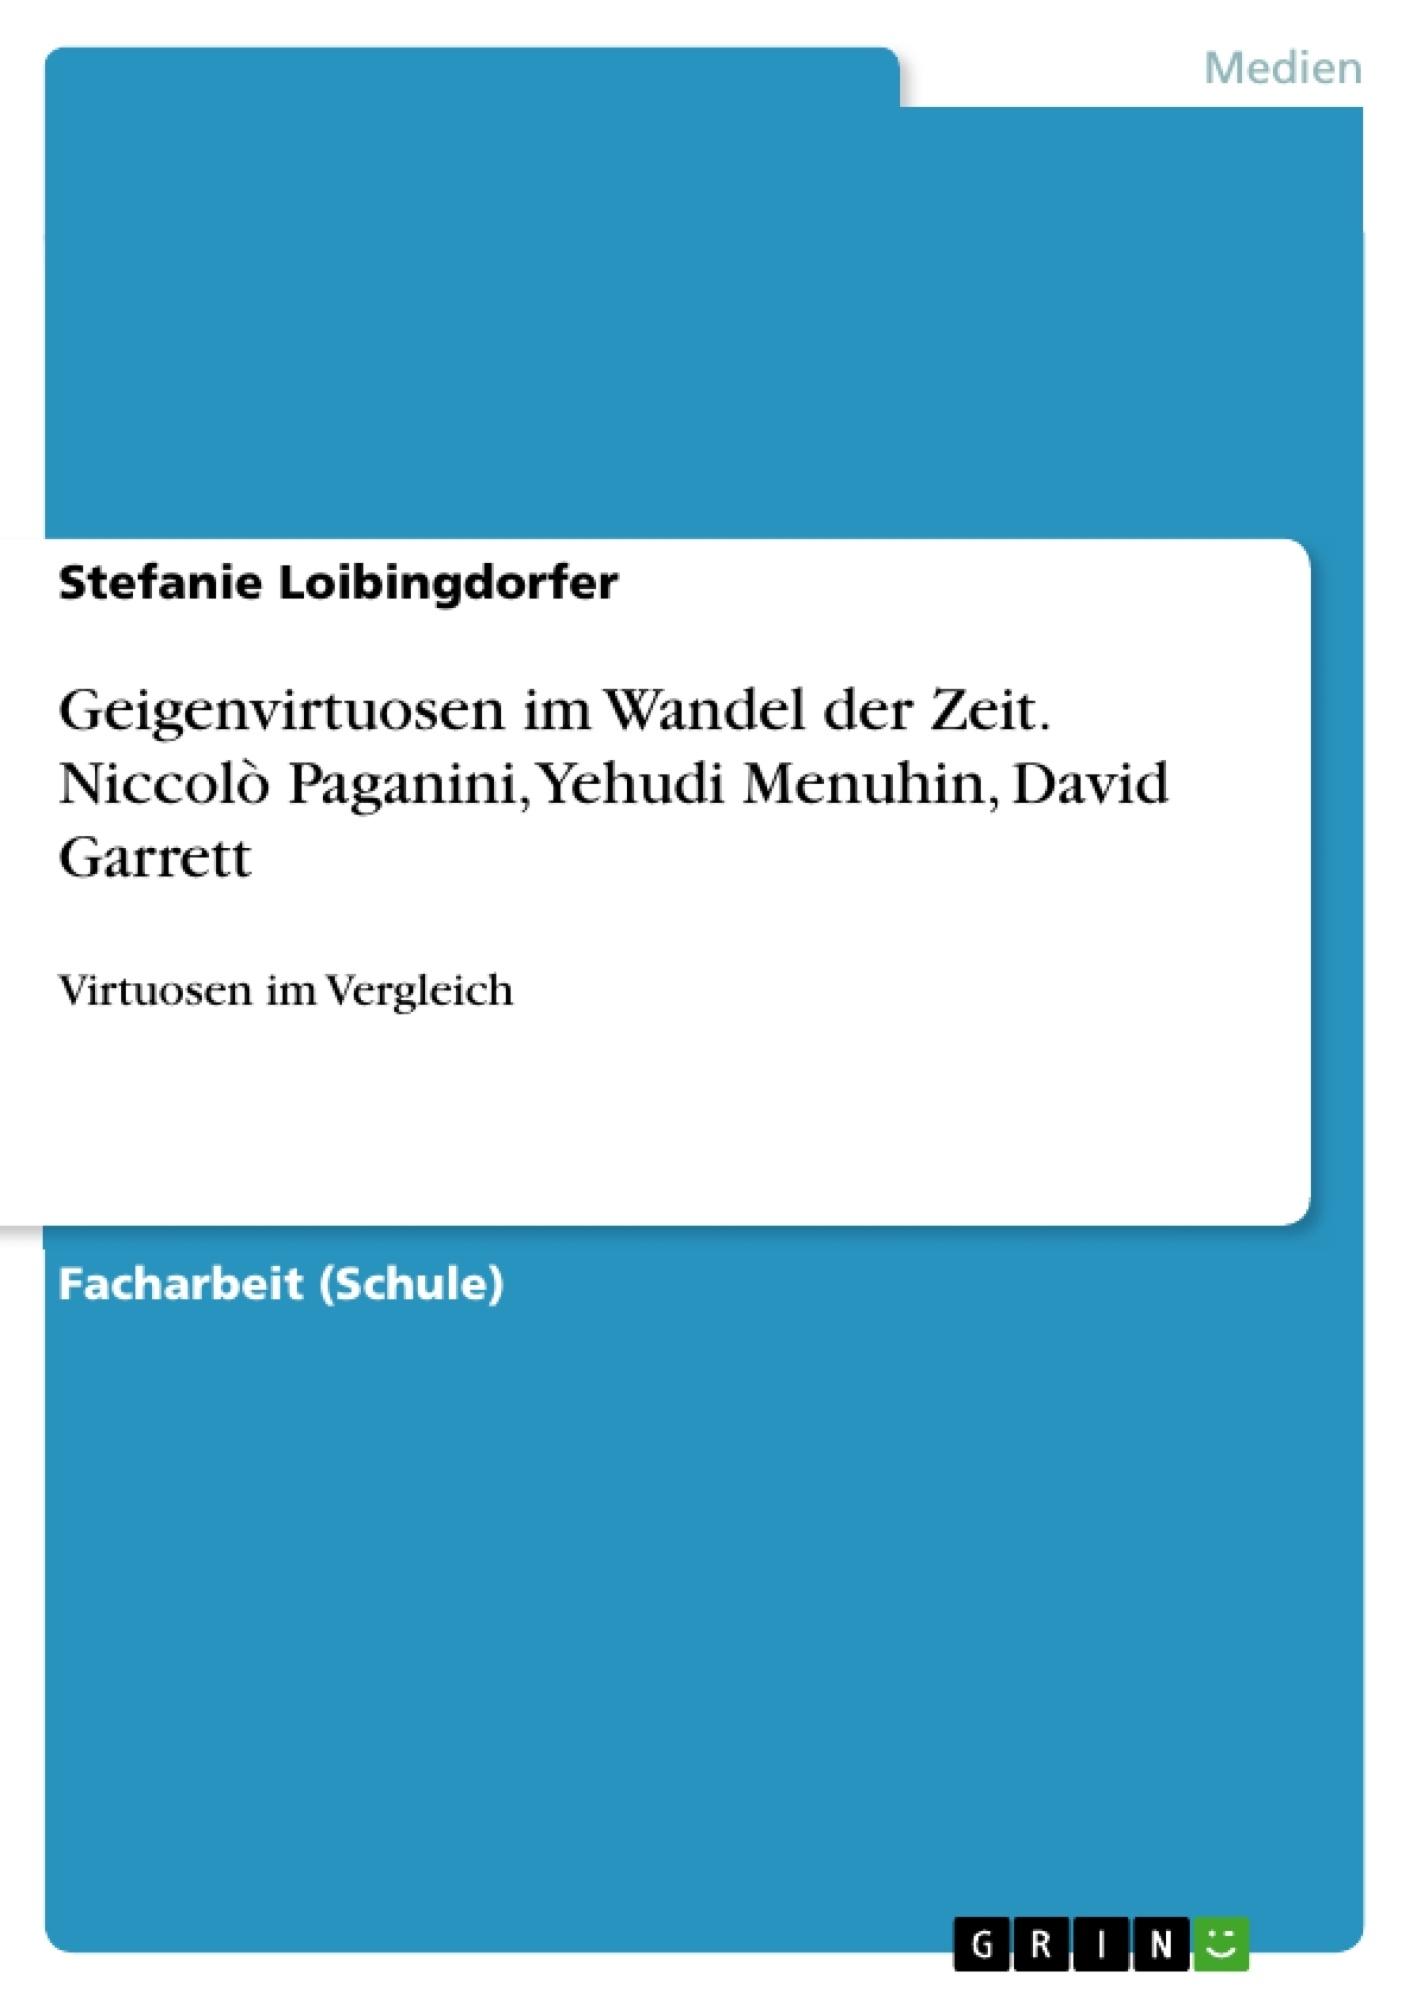 Titel: Geigenvirtuosen im Wandel der Zeit. Niccolò Paganini, Yehudi Menuhin, David Garrett